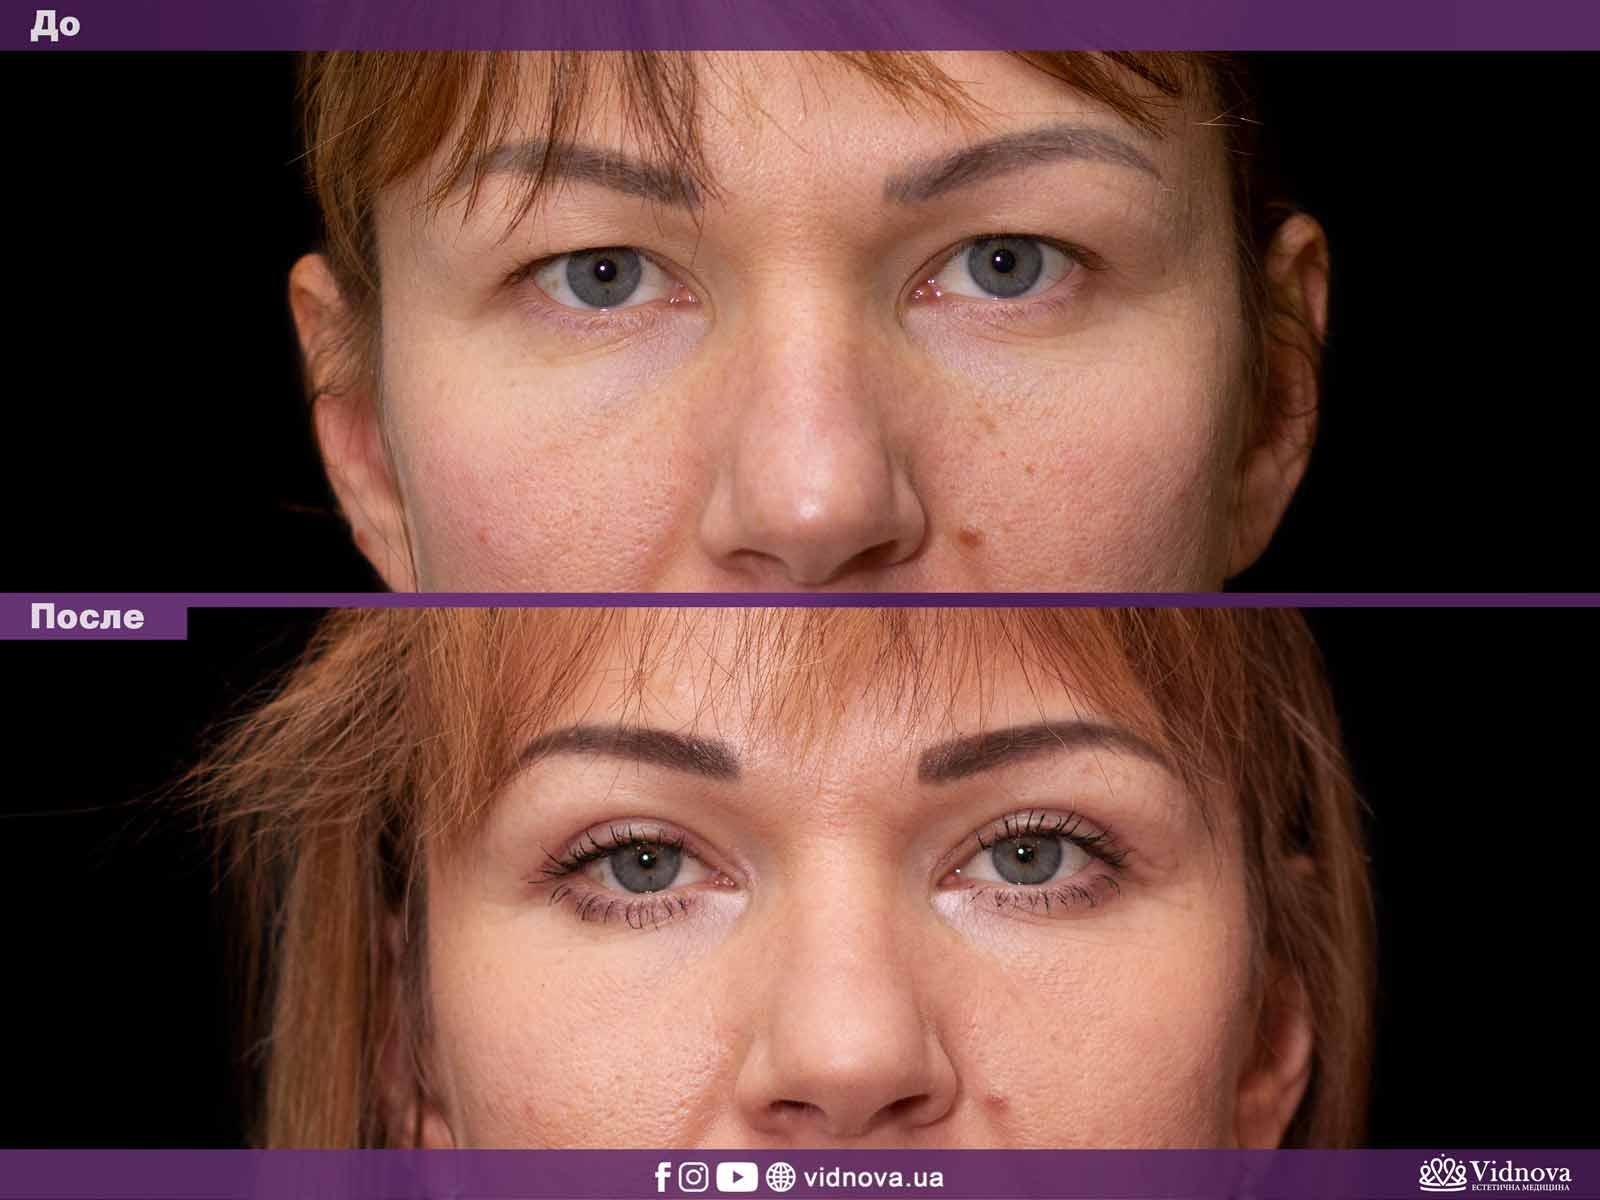 Блефаропластика: Фото До и После - Пример №27-1 - Клиника Vidnova